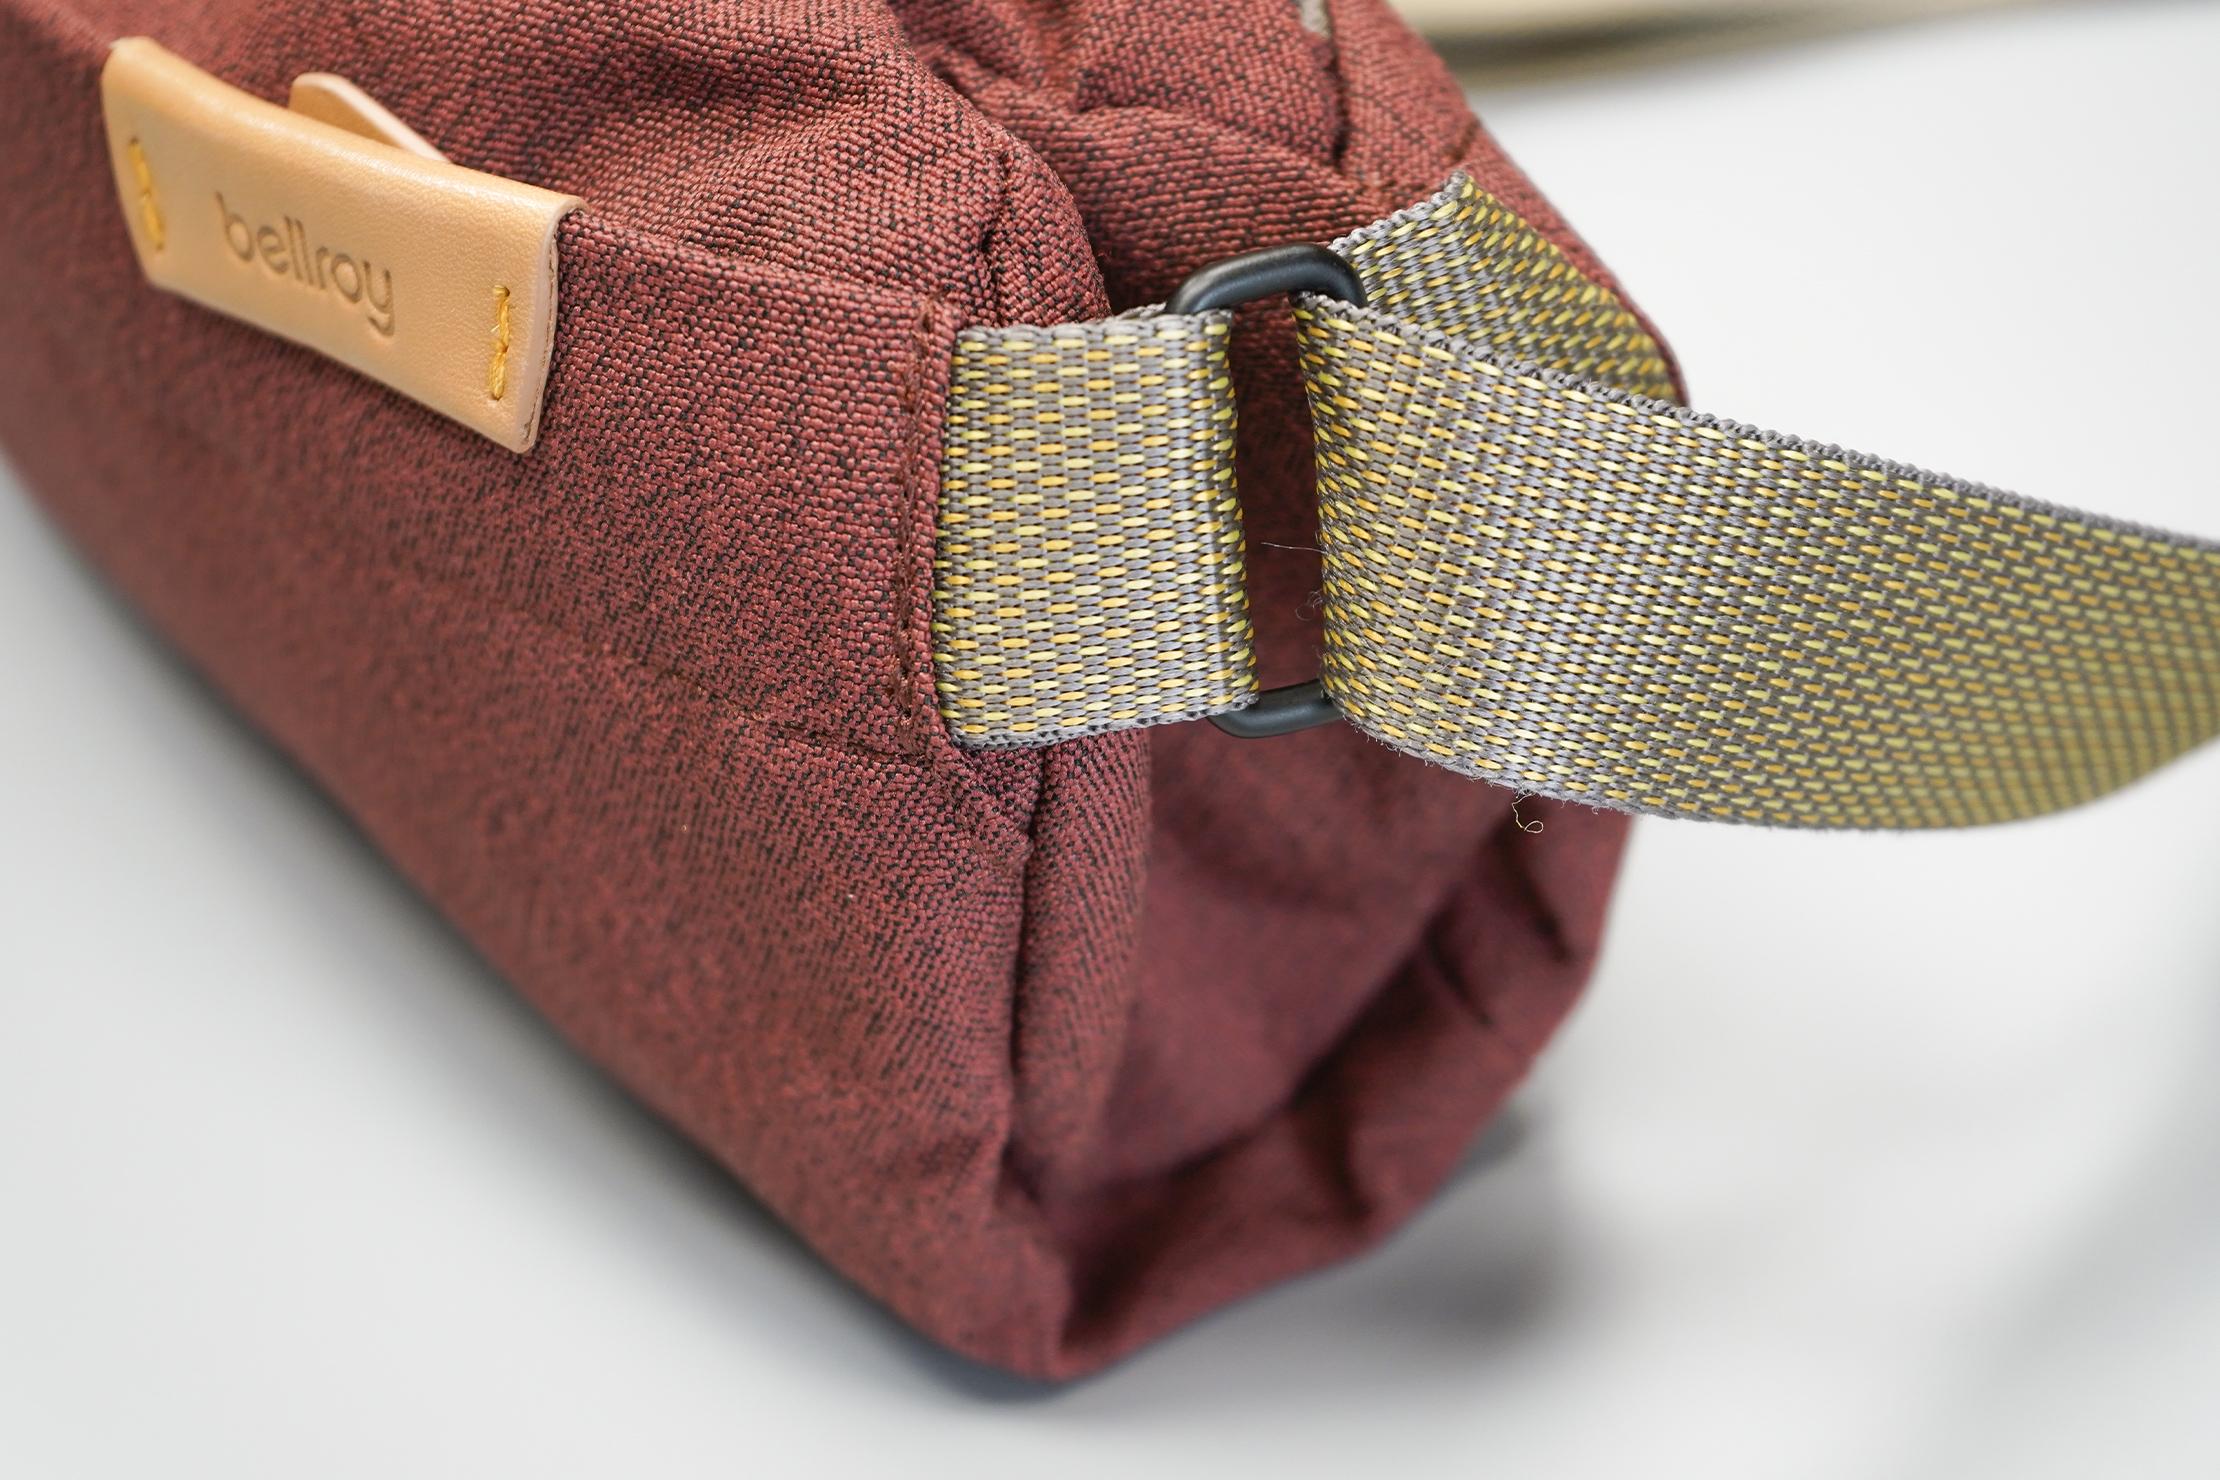 Bellroy Sling Mini | Self-compressing strap